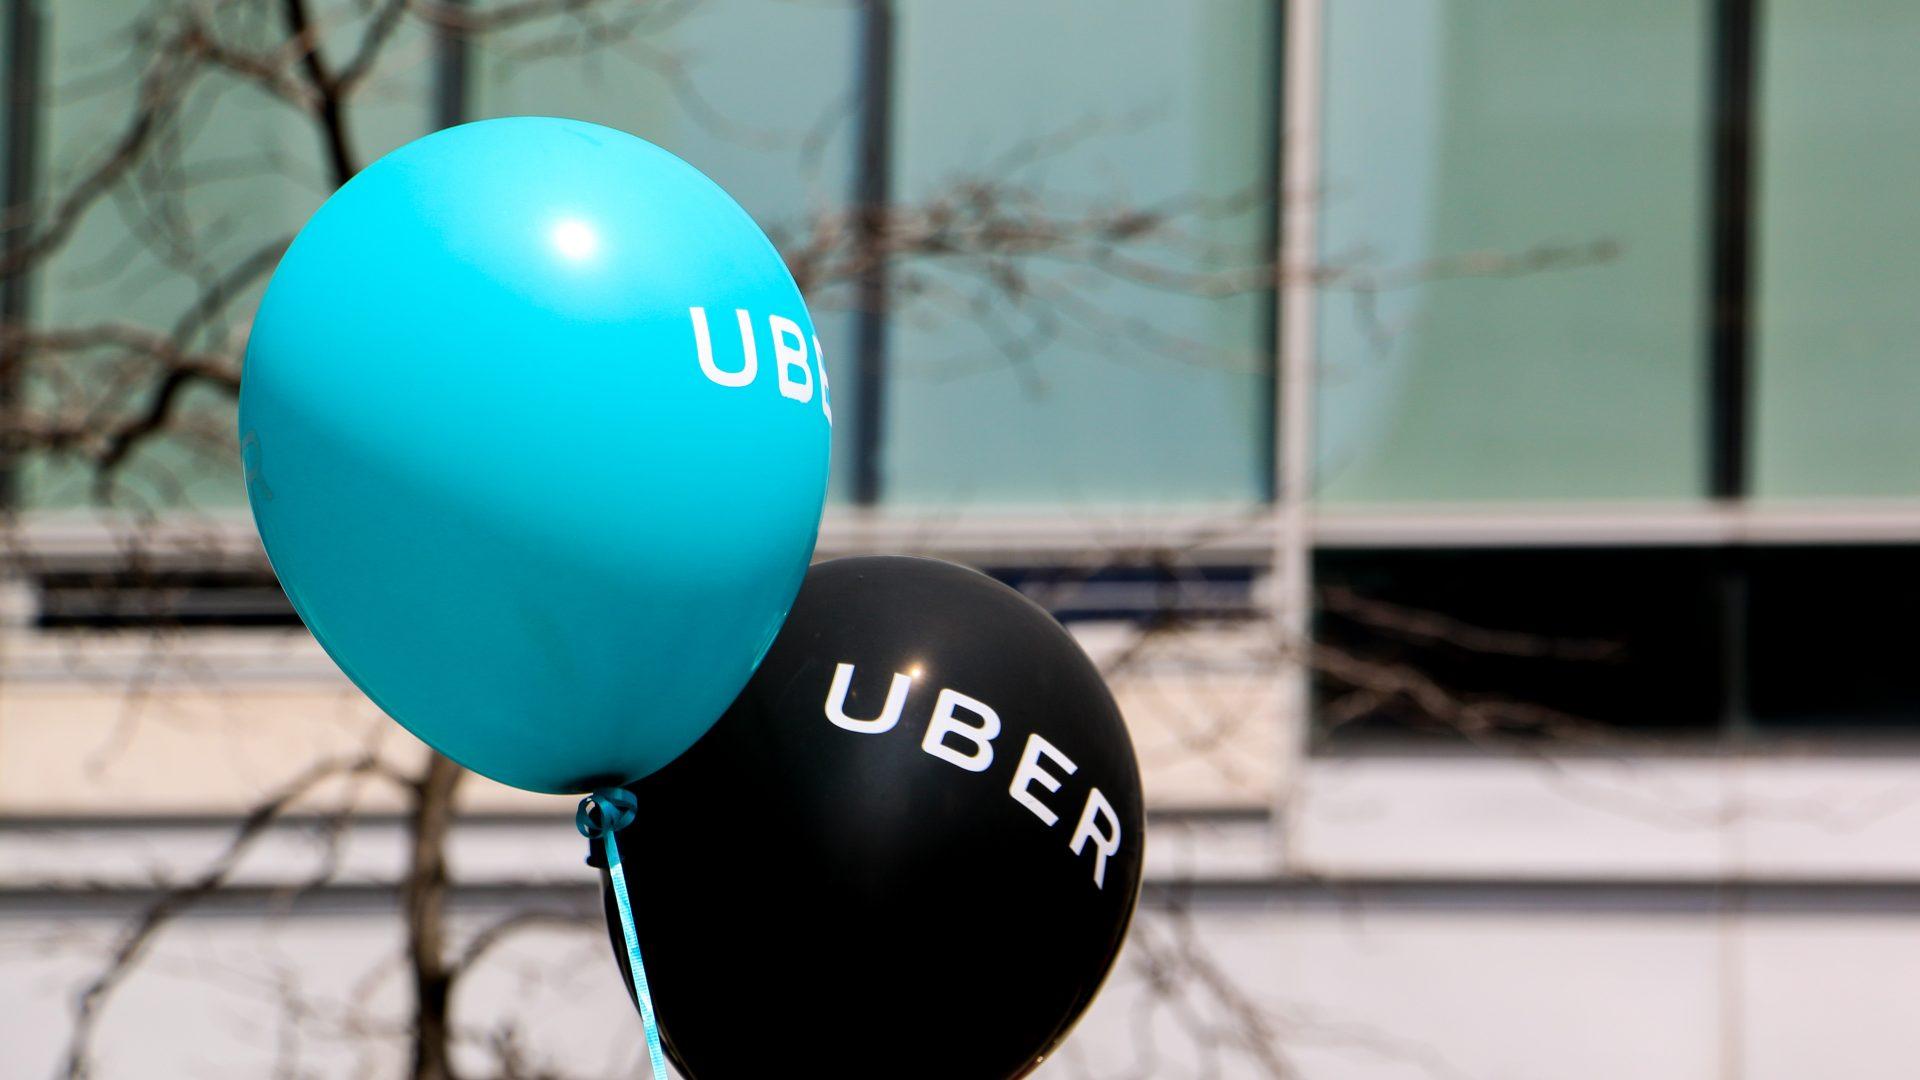 Uber interview